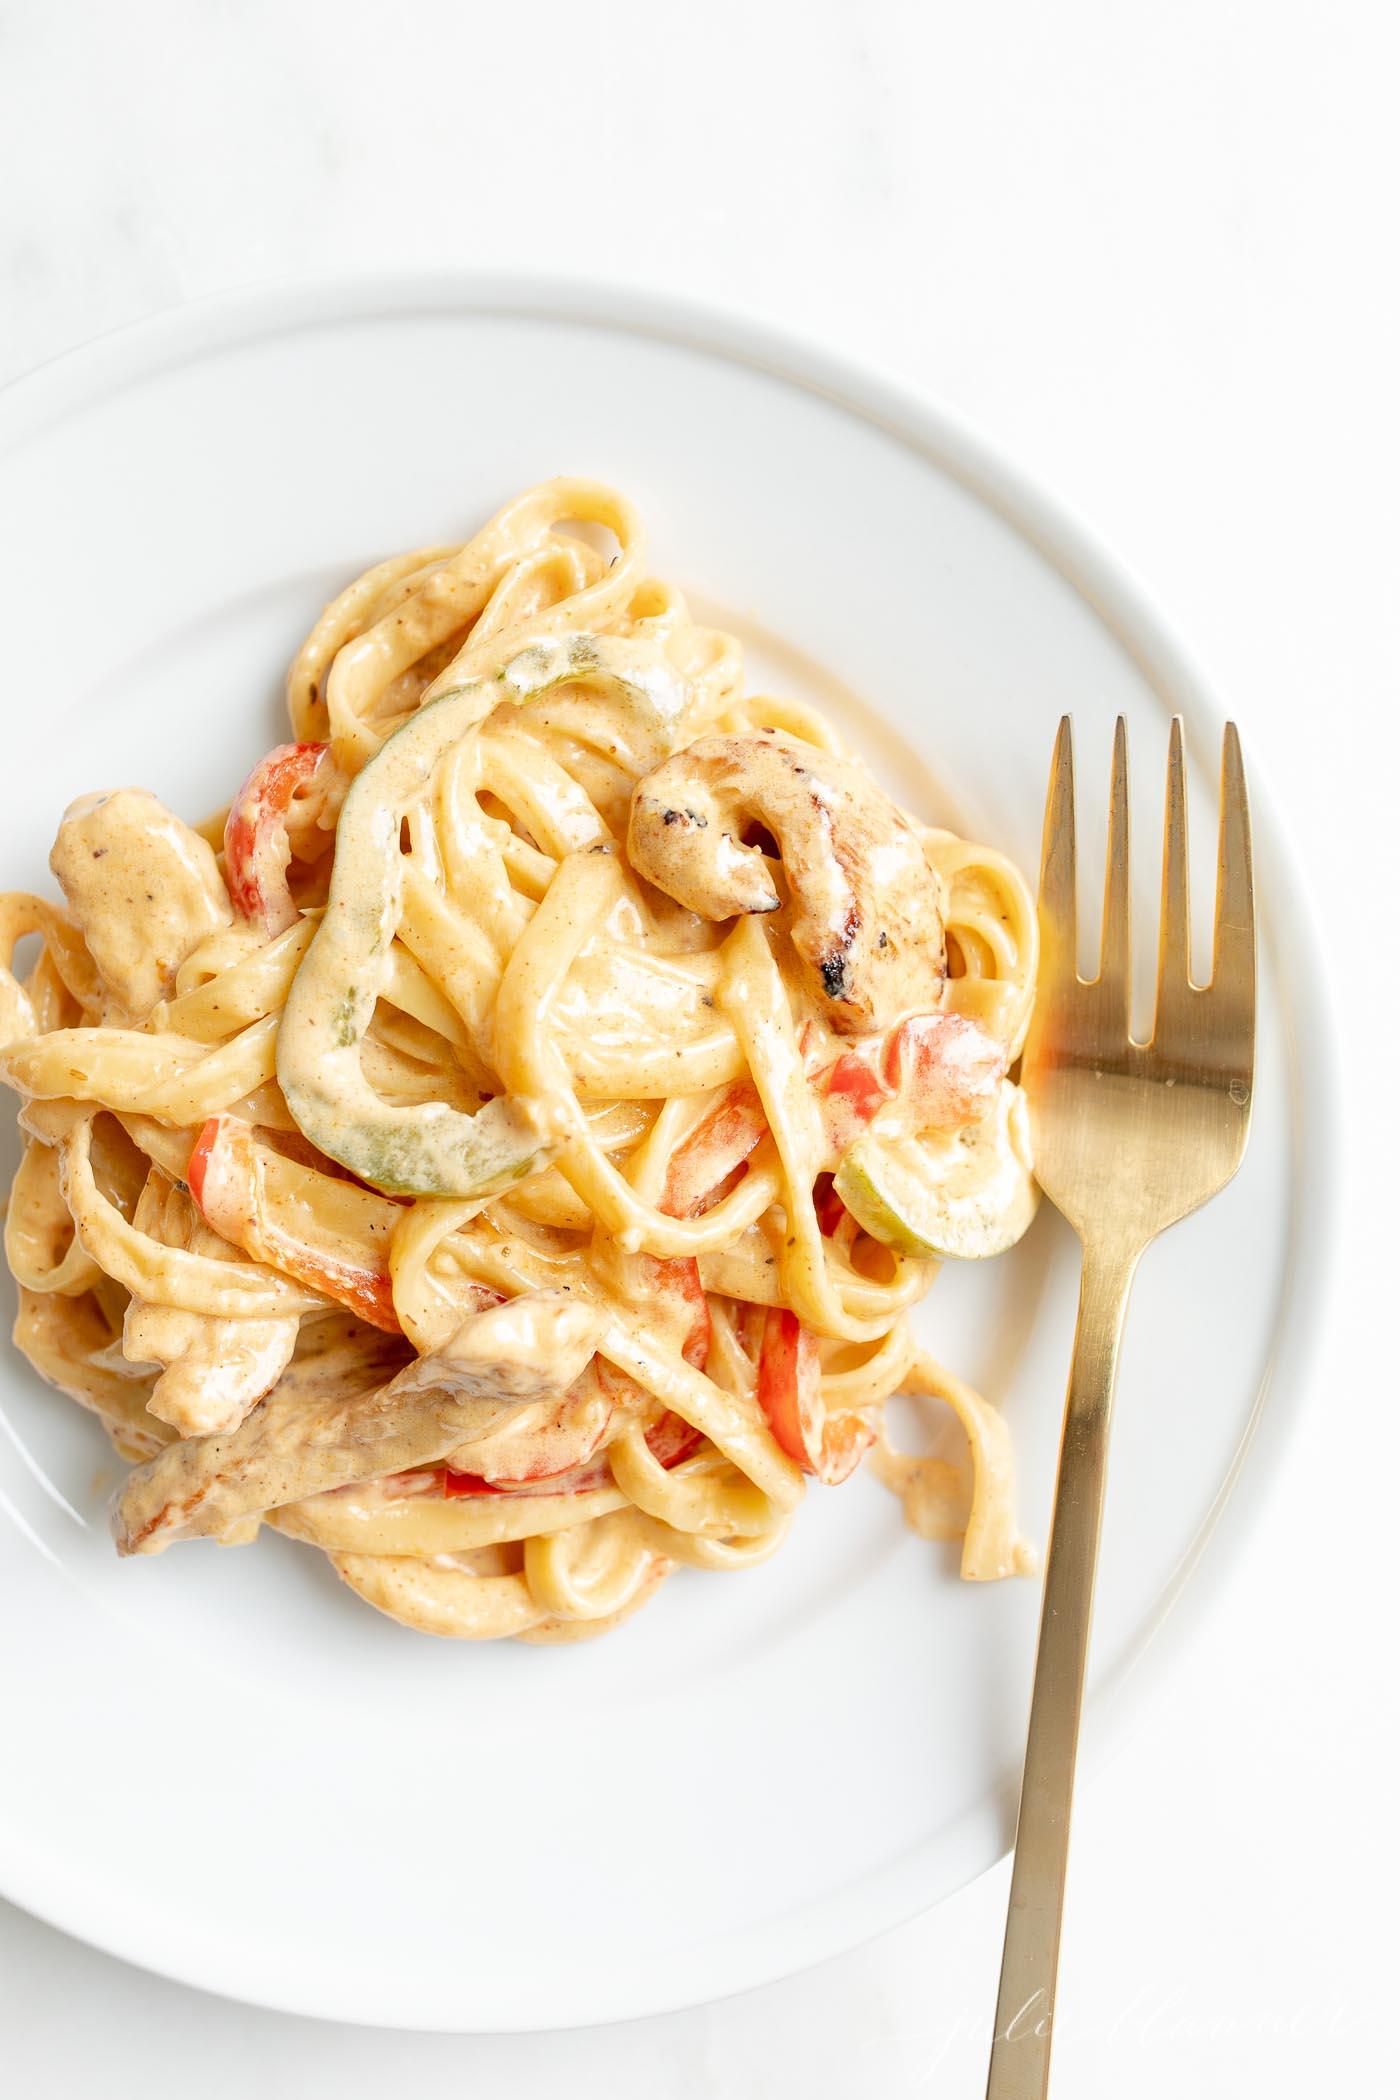 creamy chicken pasta on a plate